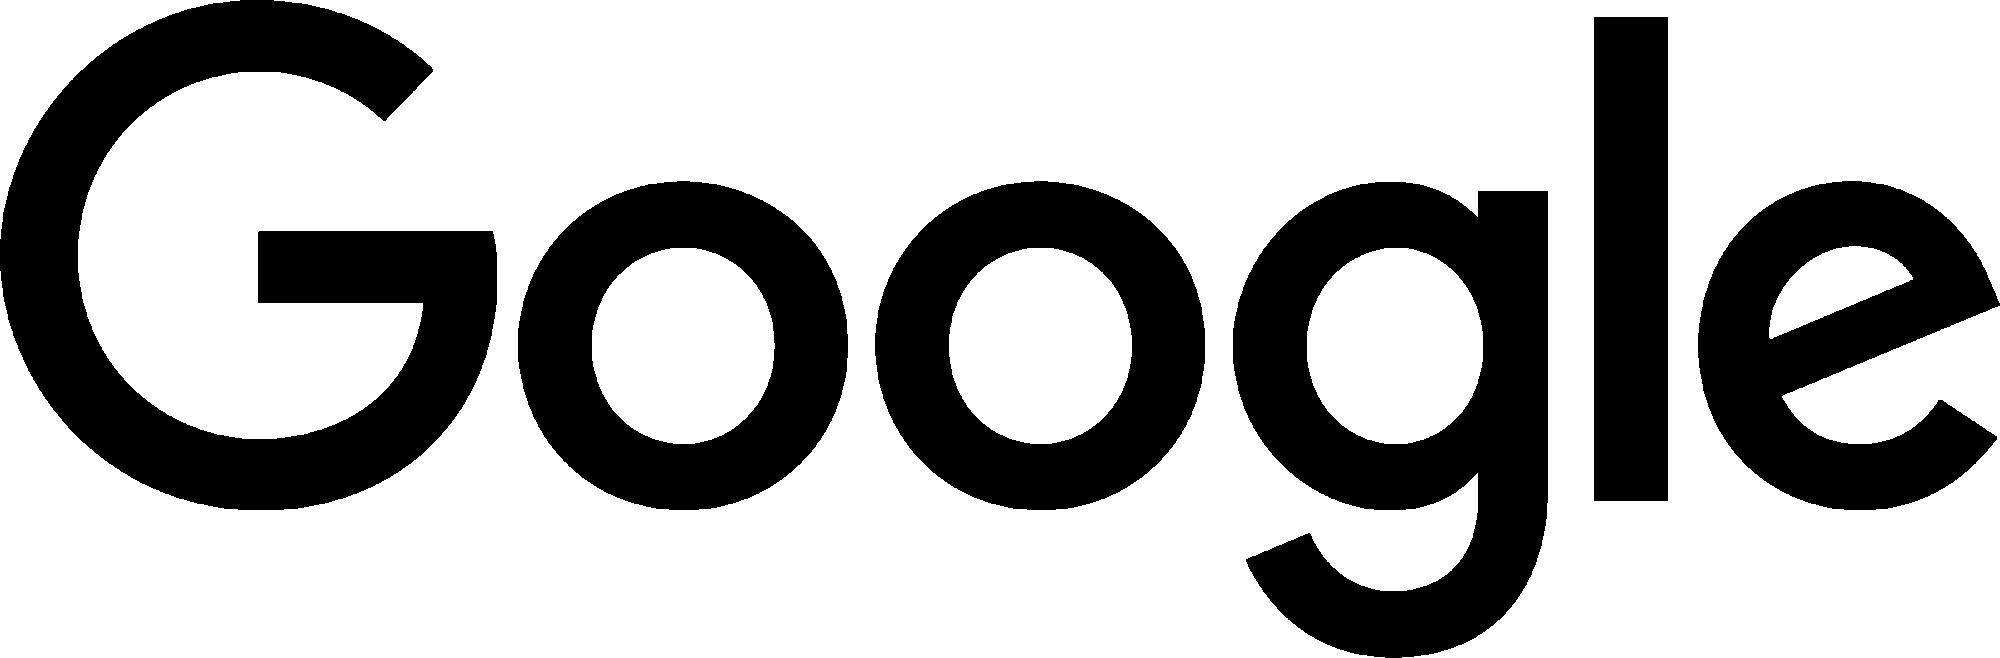 veikkaus logo black